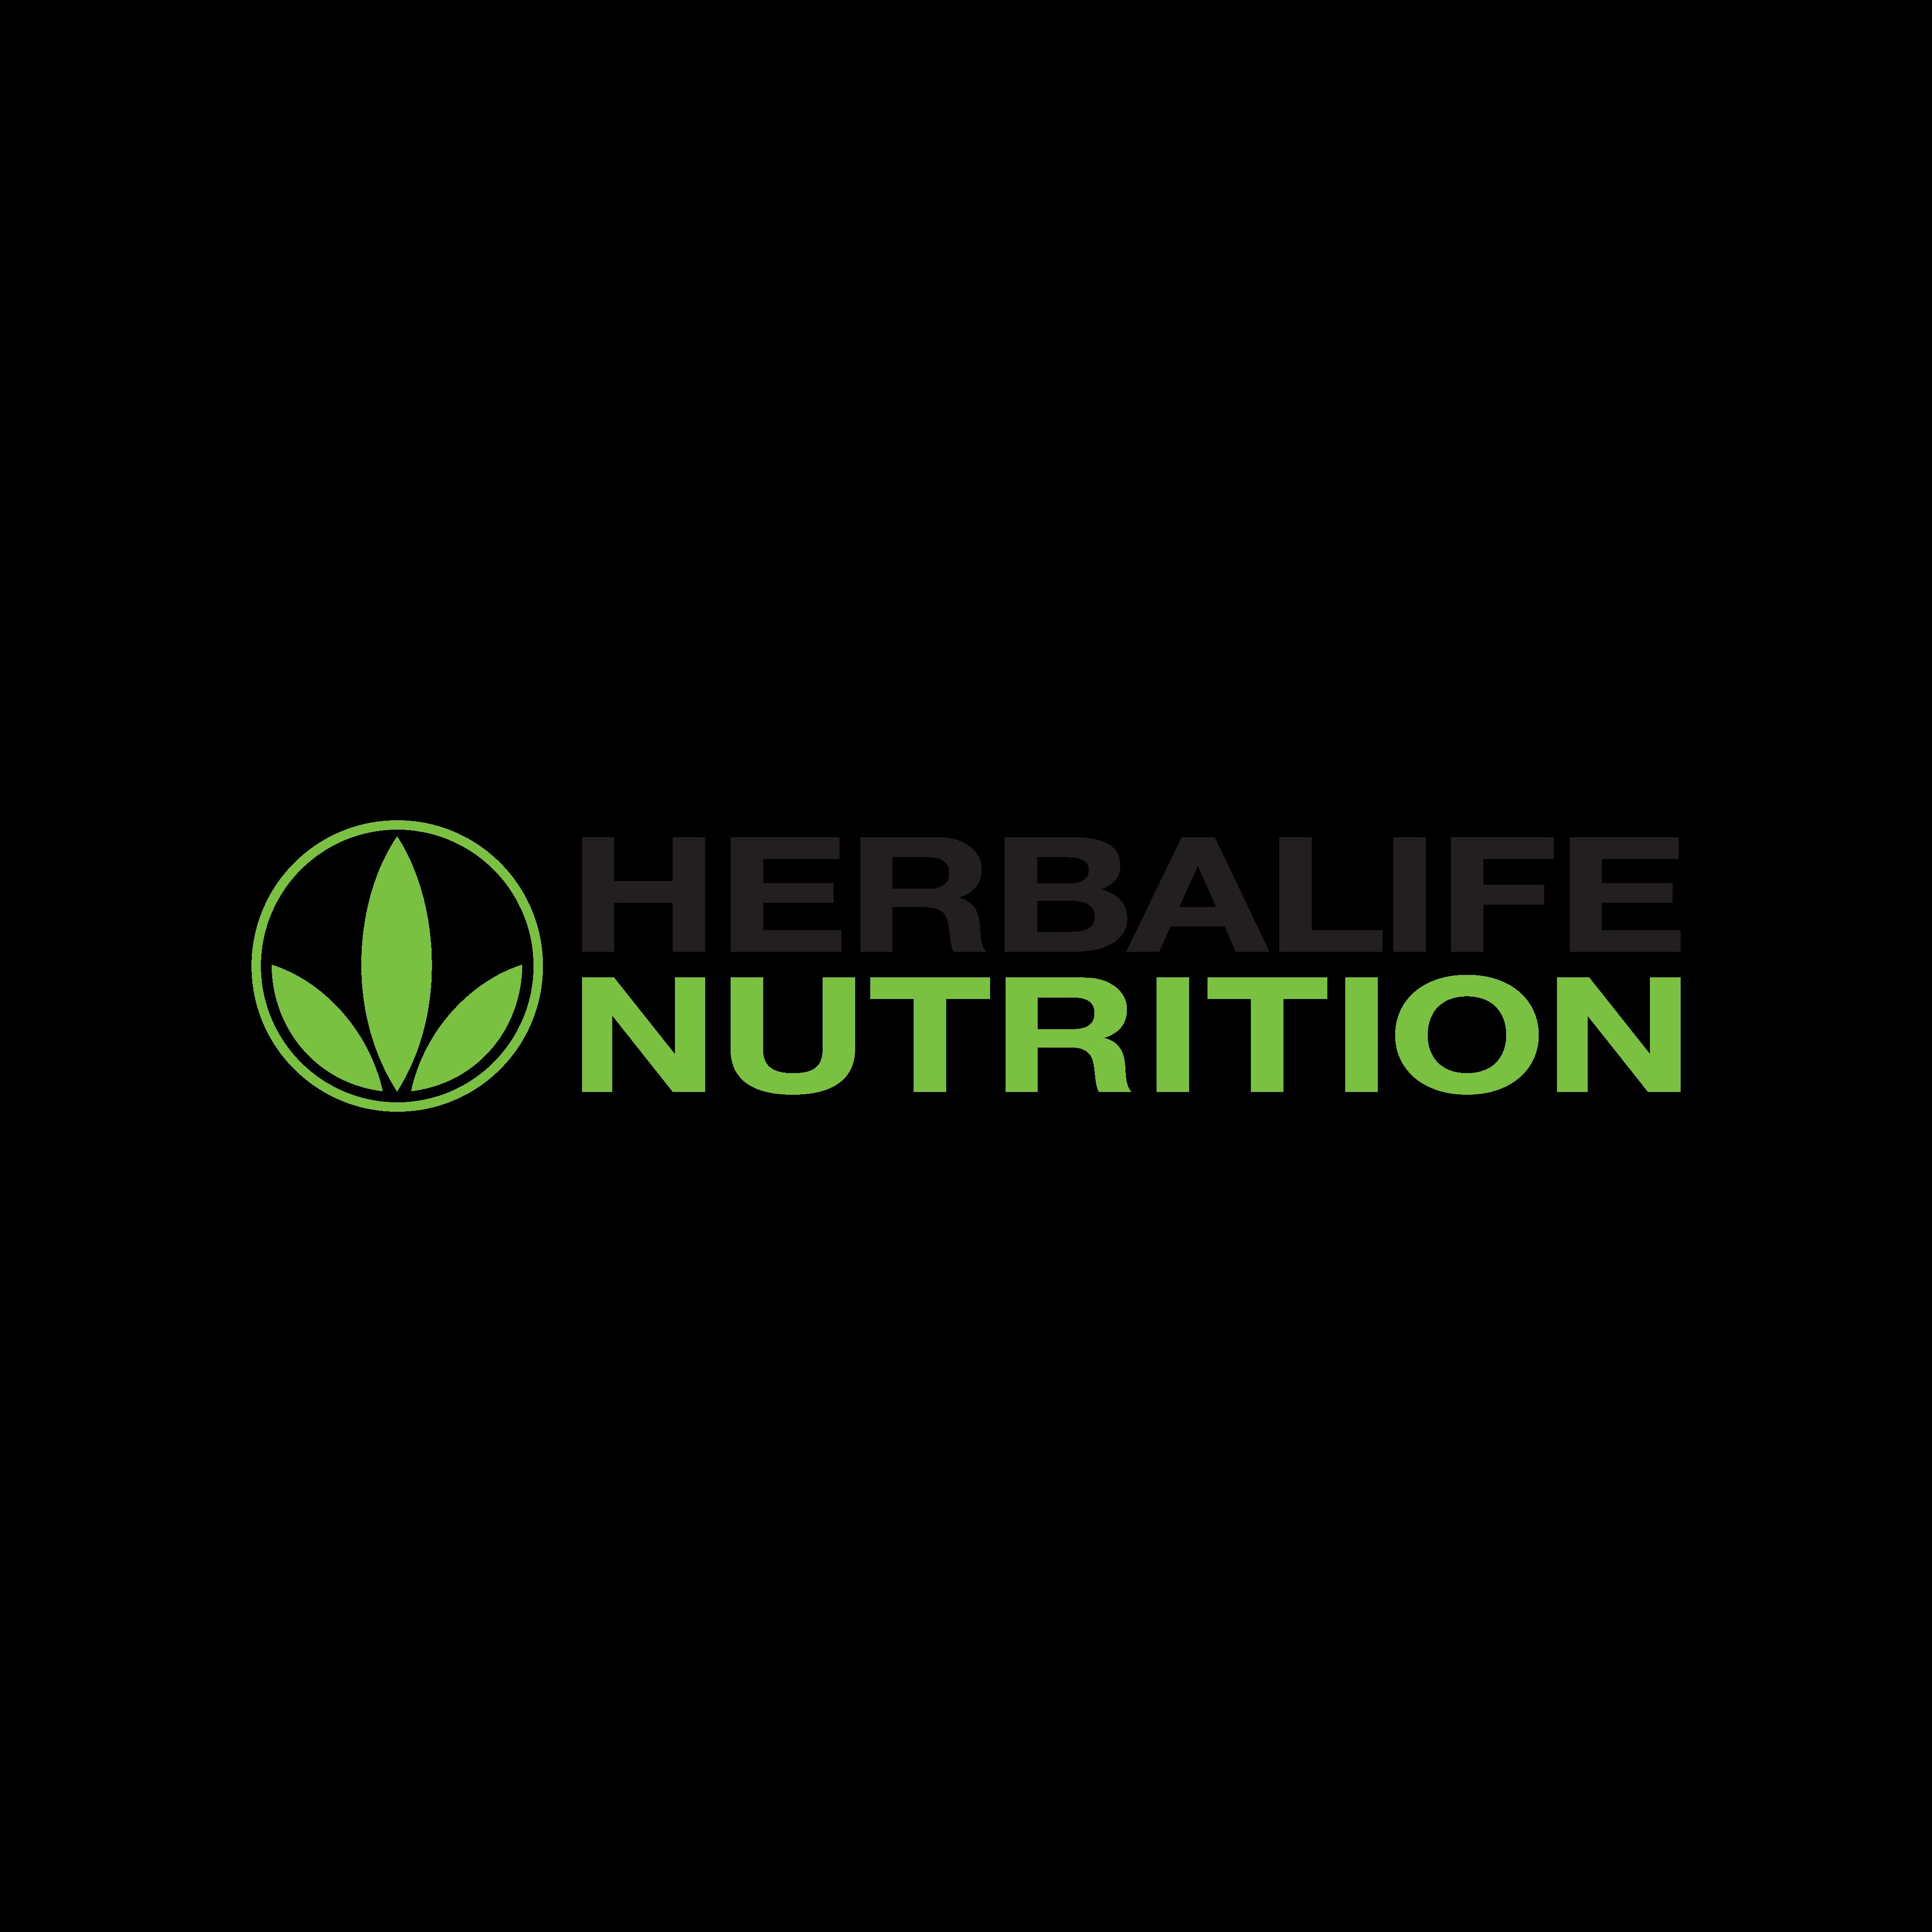 herbalife logo 0 - Herbalife Logo